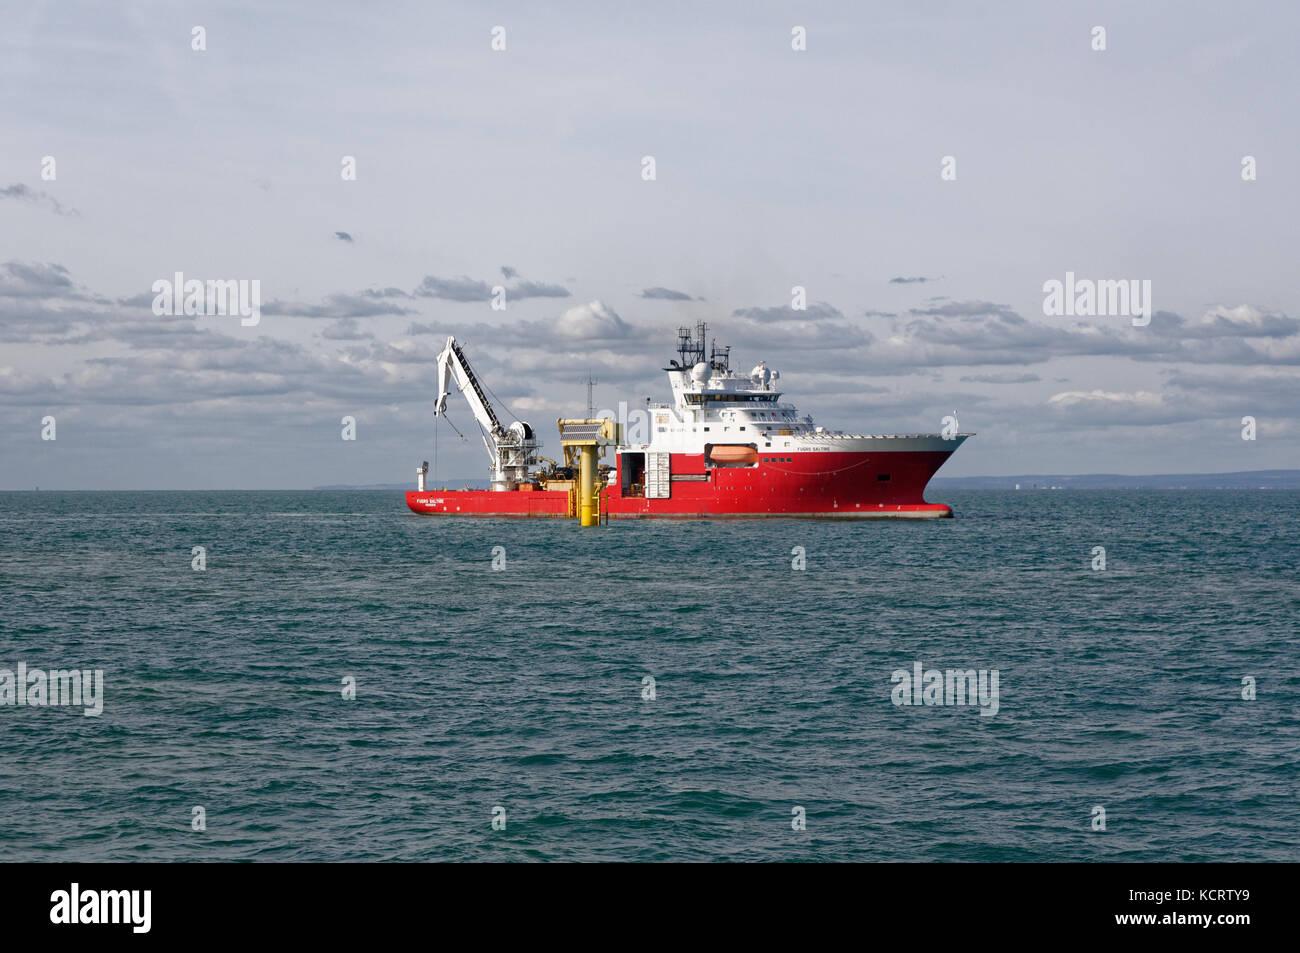 The Fugro Saltire at the Rampion Offshore Windfarm, near Brighton, England. - Stock Image